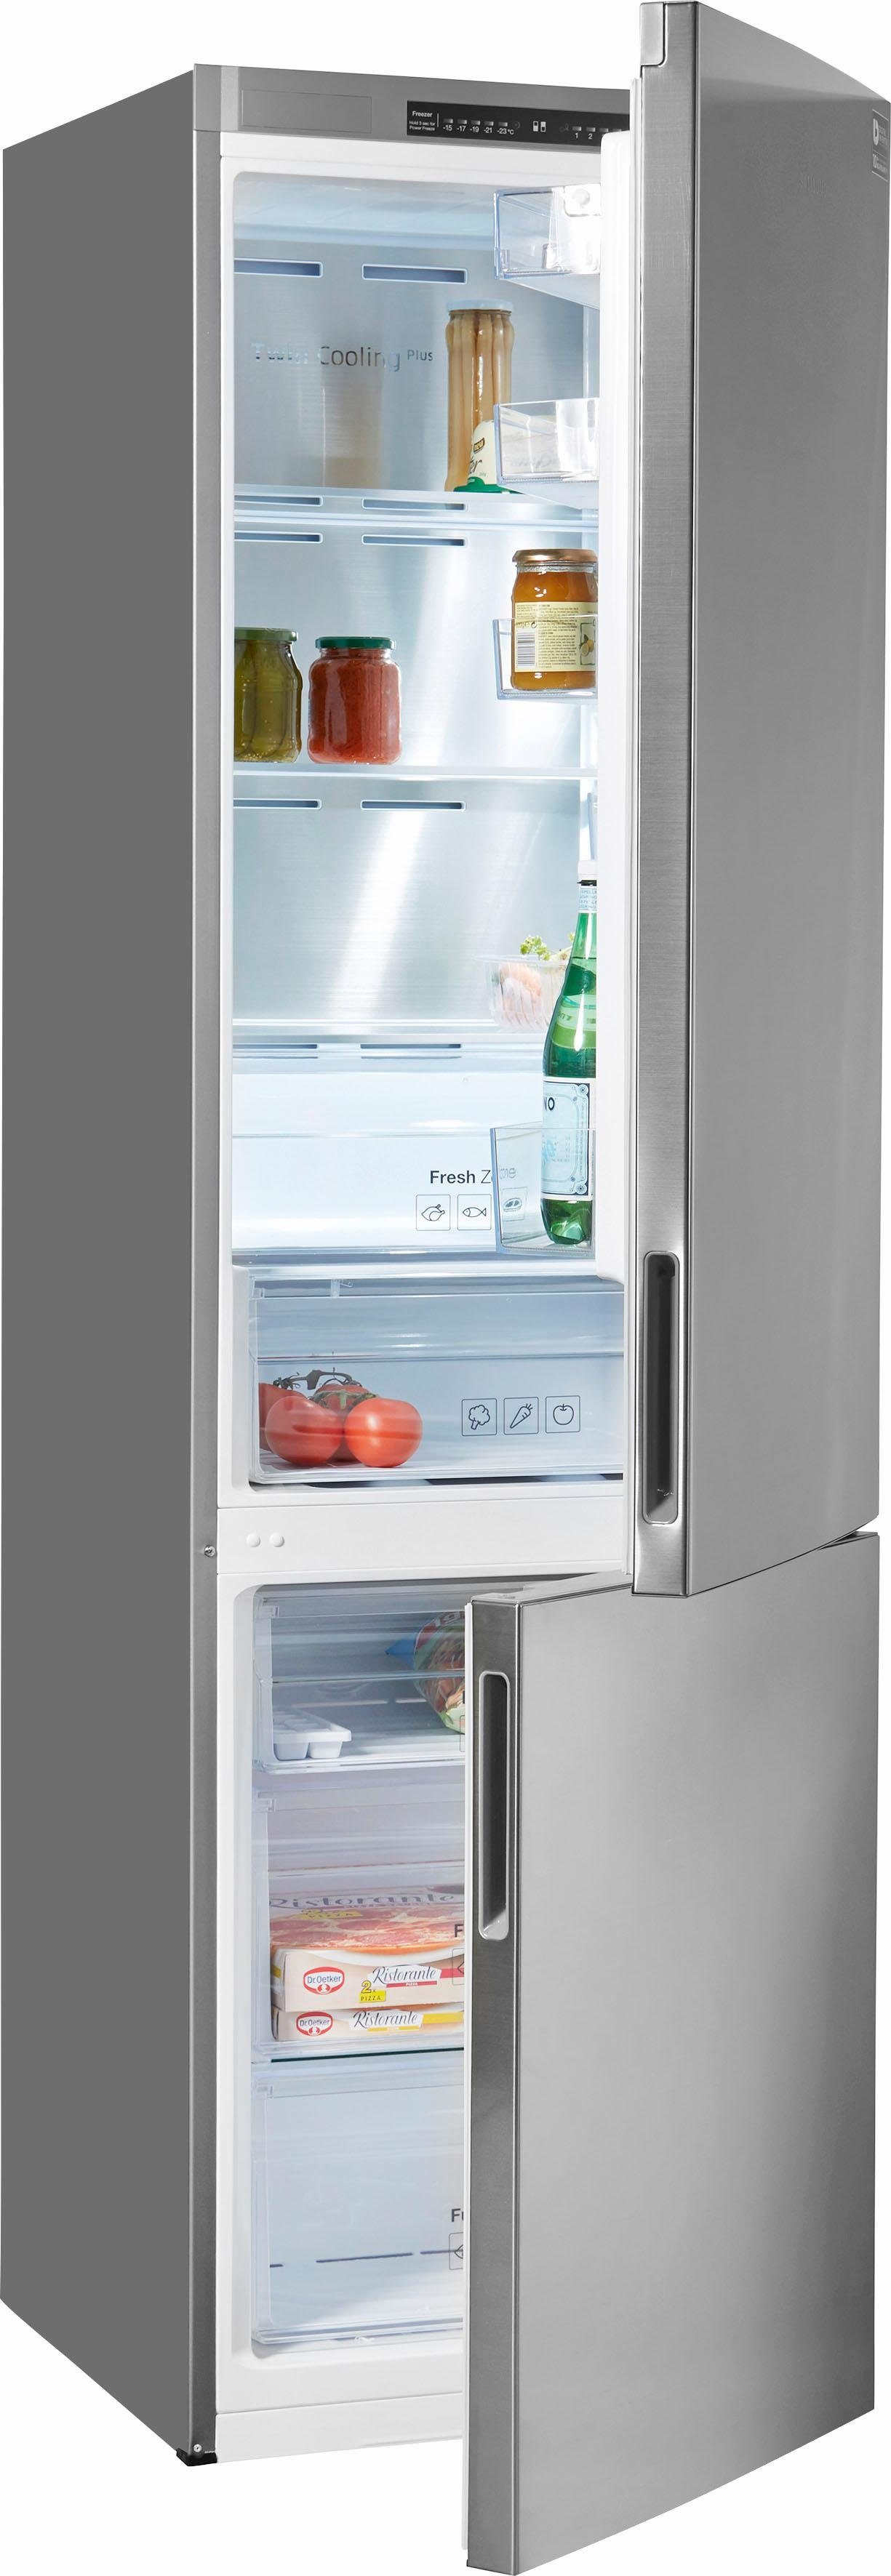 Samsung Kühl-/Gefrierkombination RL37J5009SS/EF, Enerergieklasse A+++, 201 cm hoch, NoFrost